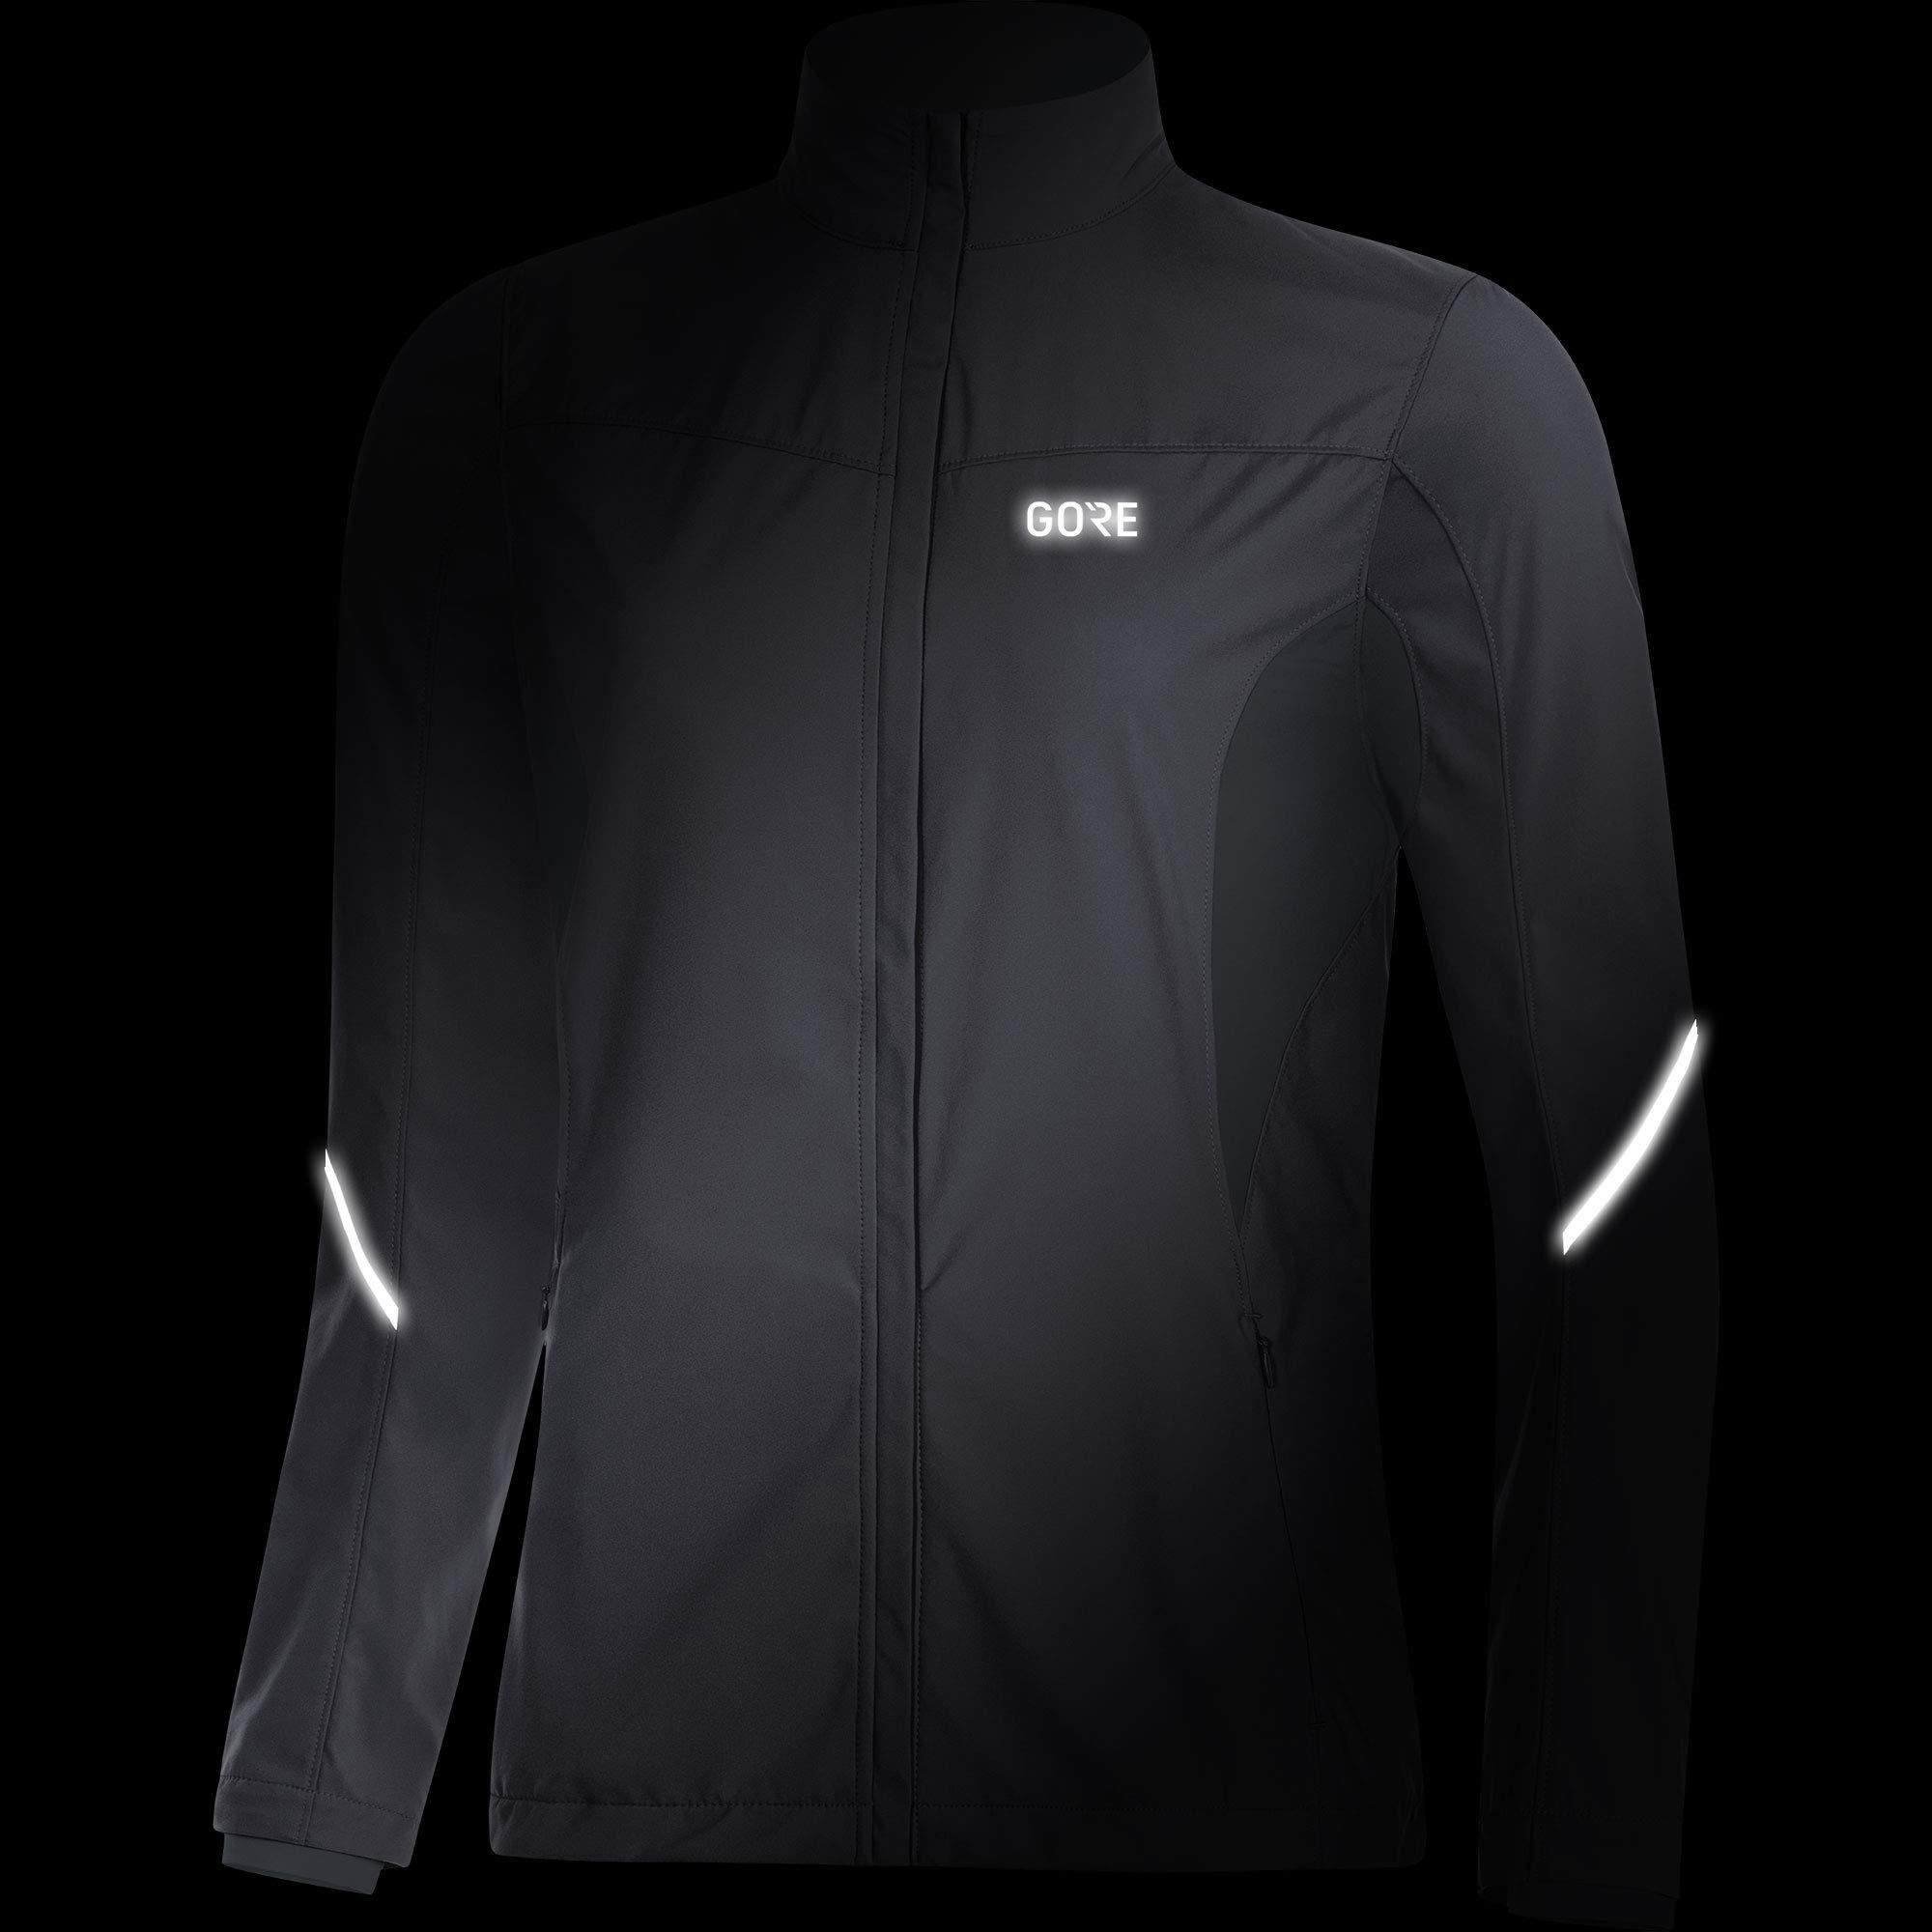 Gore Women's R3 Wmn Partial Gws Jacket,  terra grey/black,  M by GORE WEAR (Image #3)